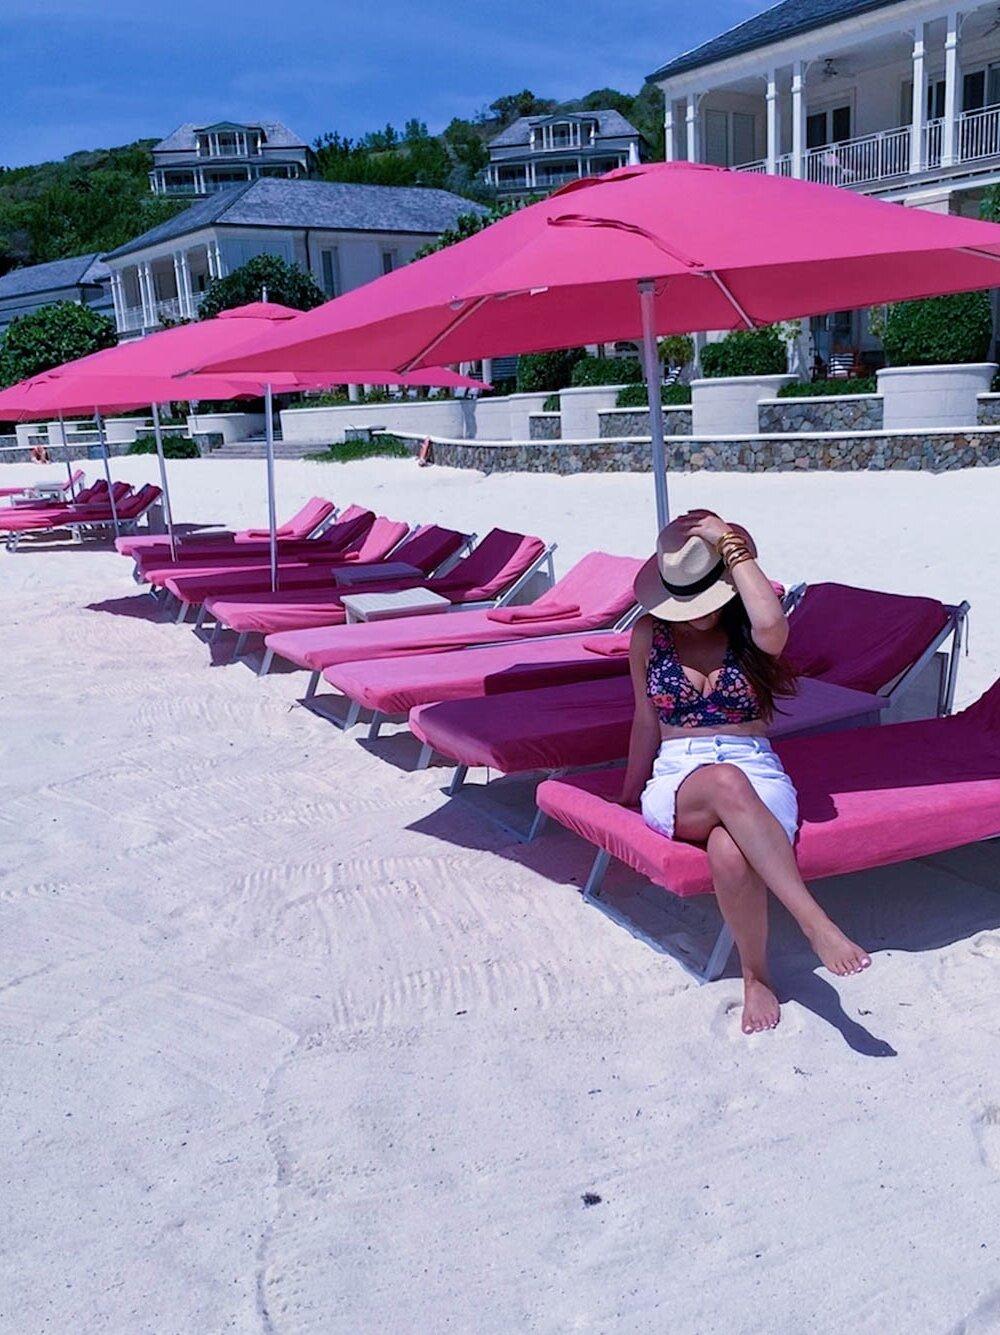 Mandarin+Oriental+Canouan+-+Best+Canouan+Hotel_Addie+Bell_Best+Travel+Agent-14.jpg